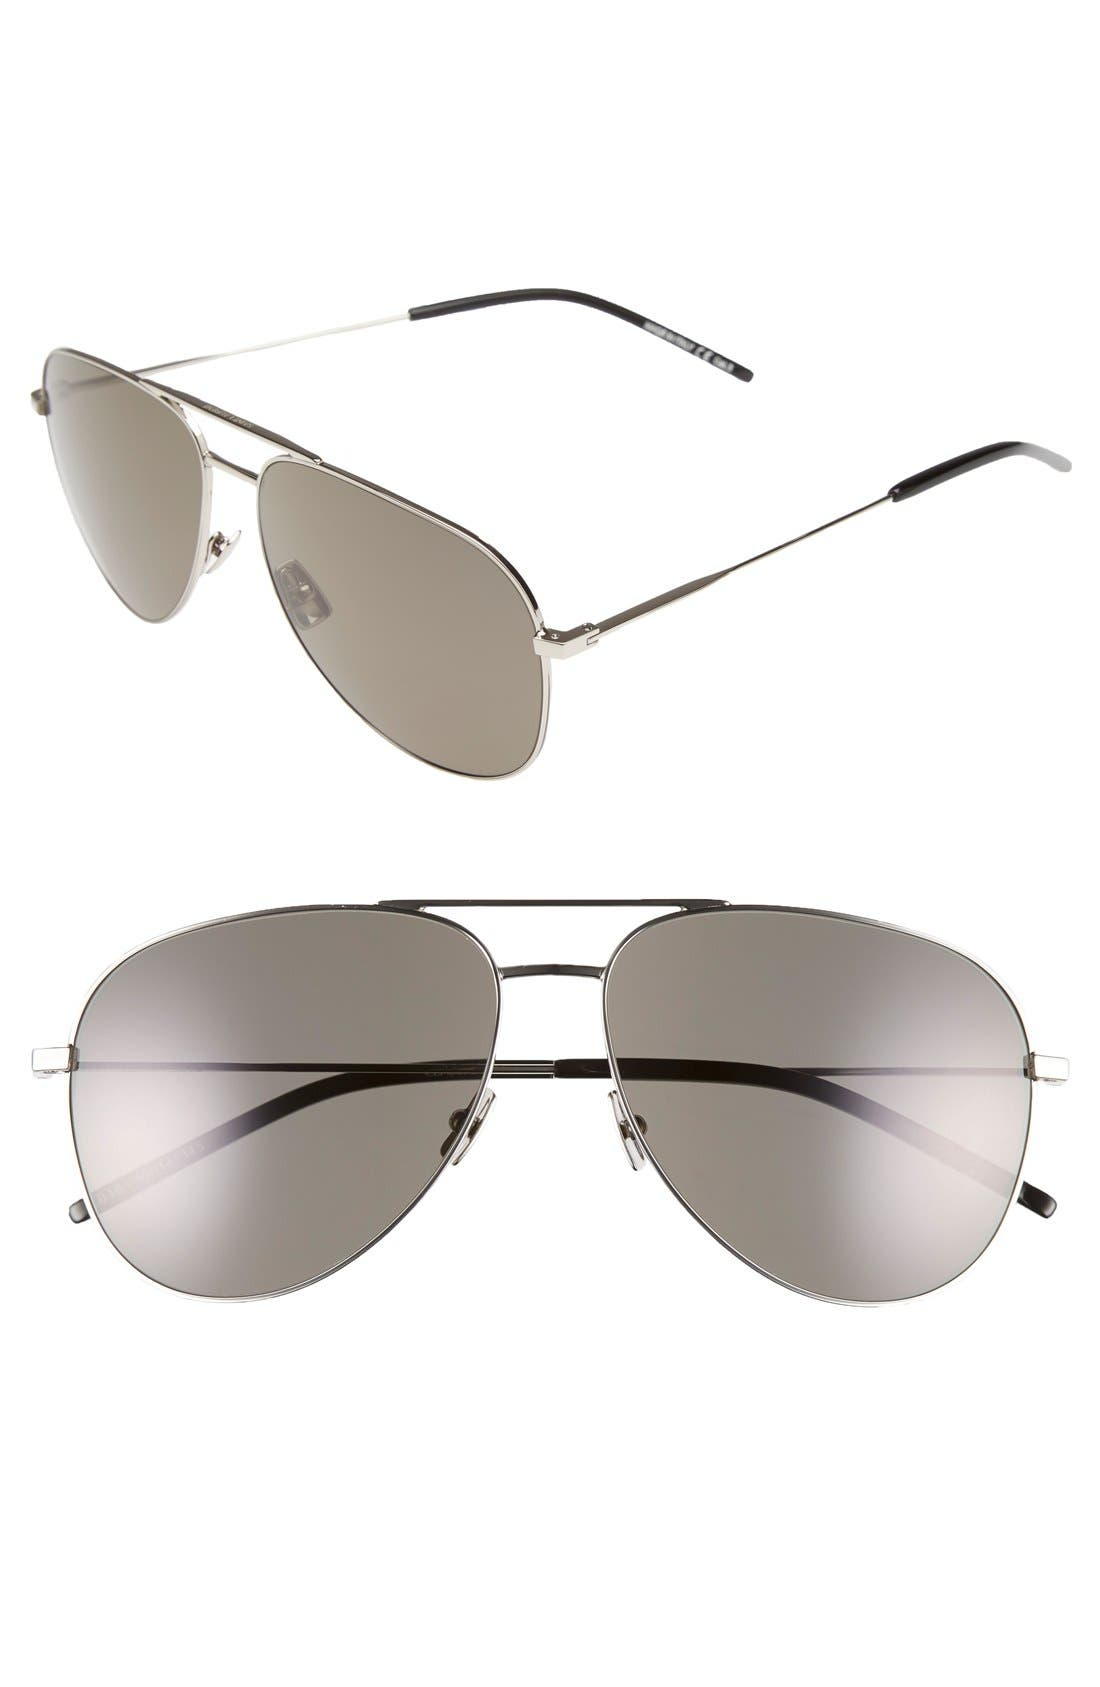 Main Image - Saint Laurent 'Classic' 59mm Aviator Sunglasses